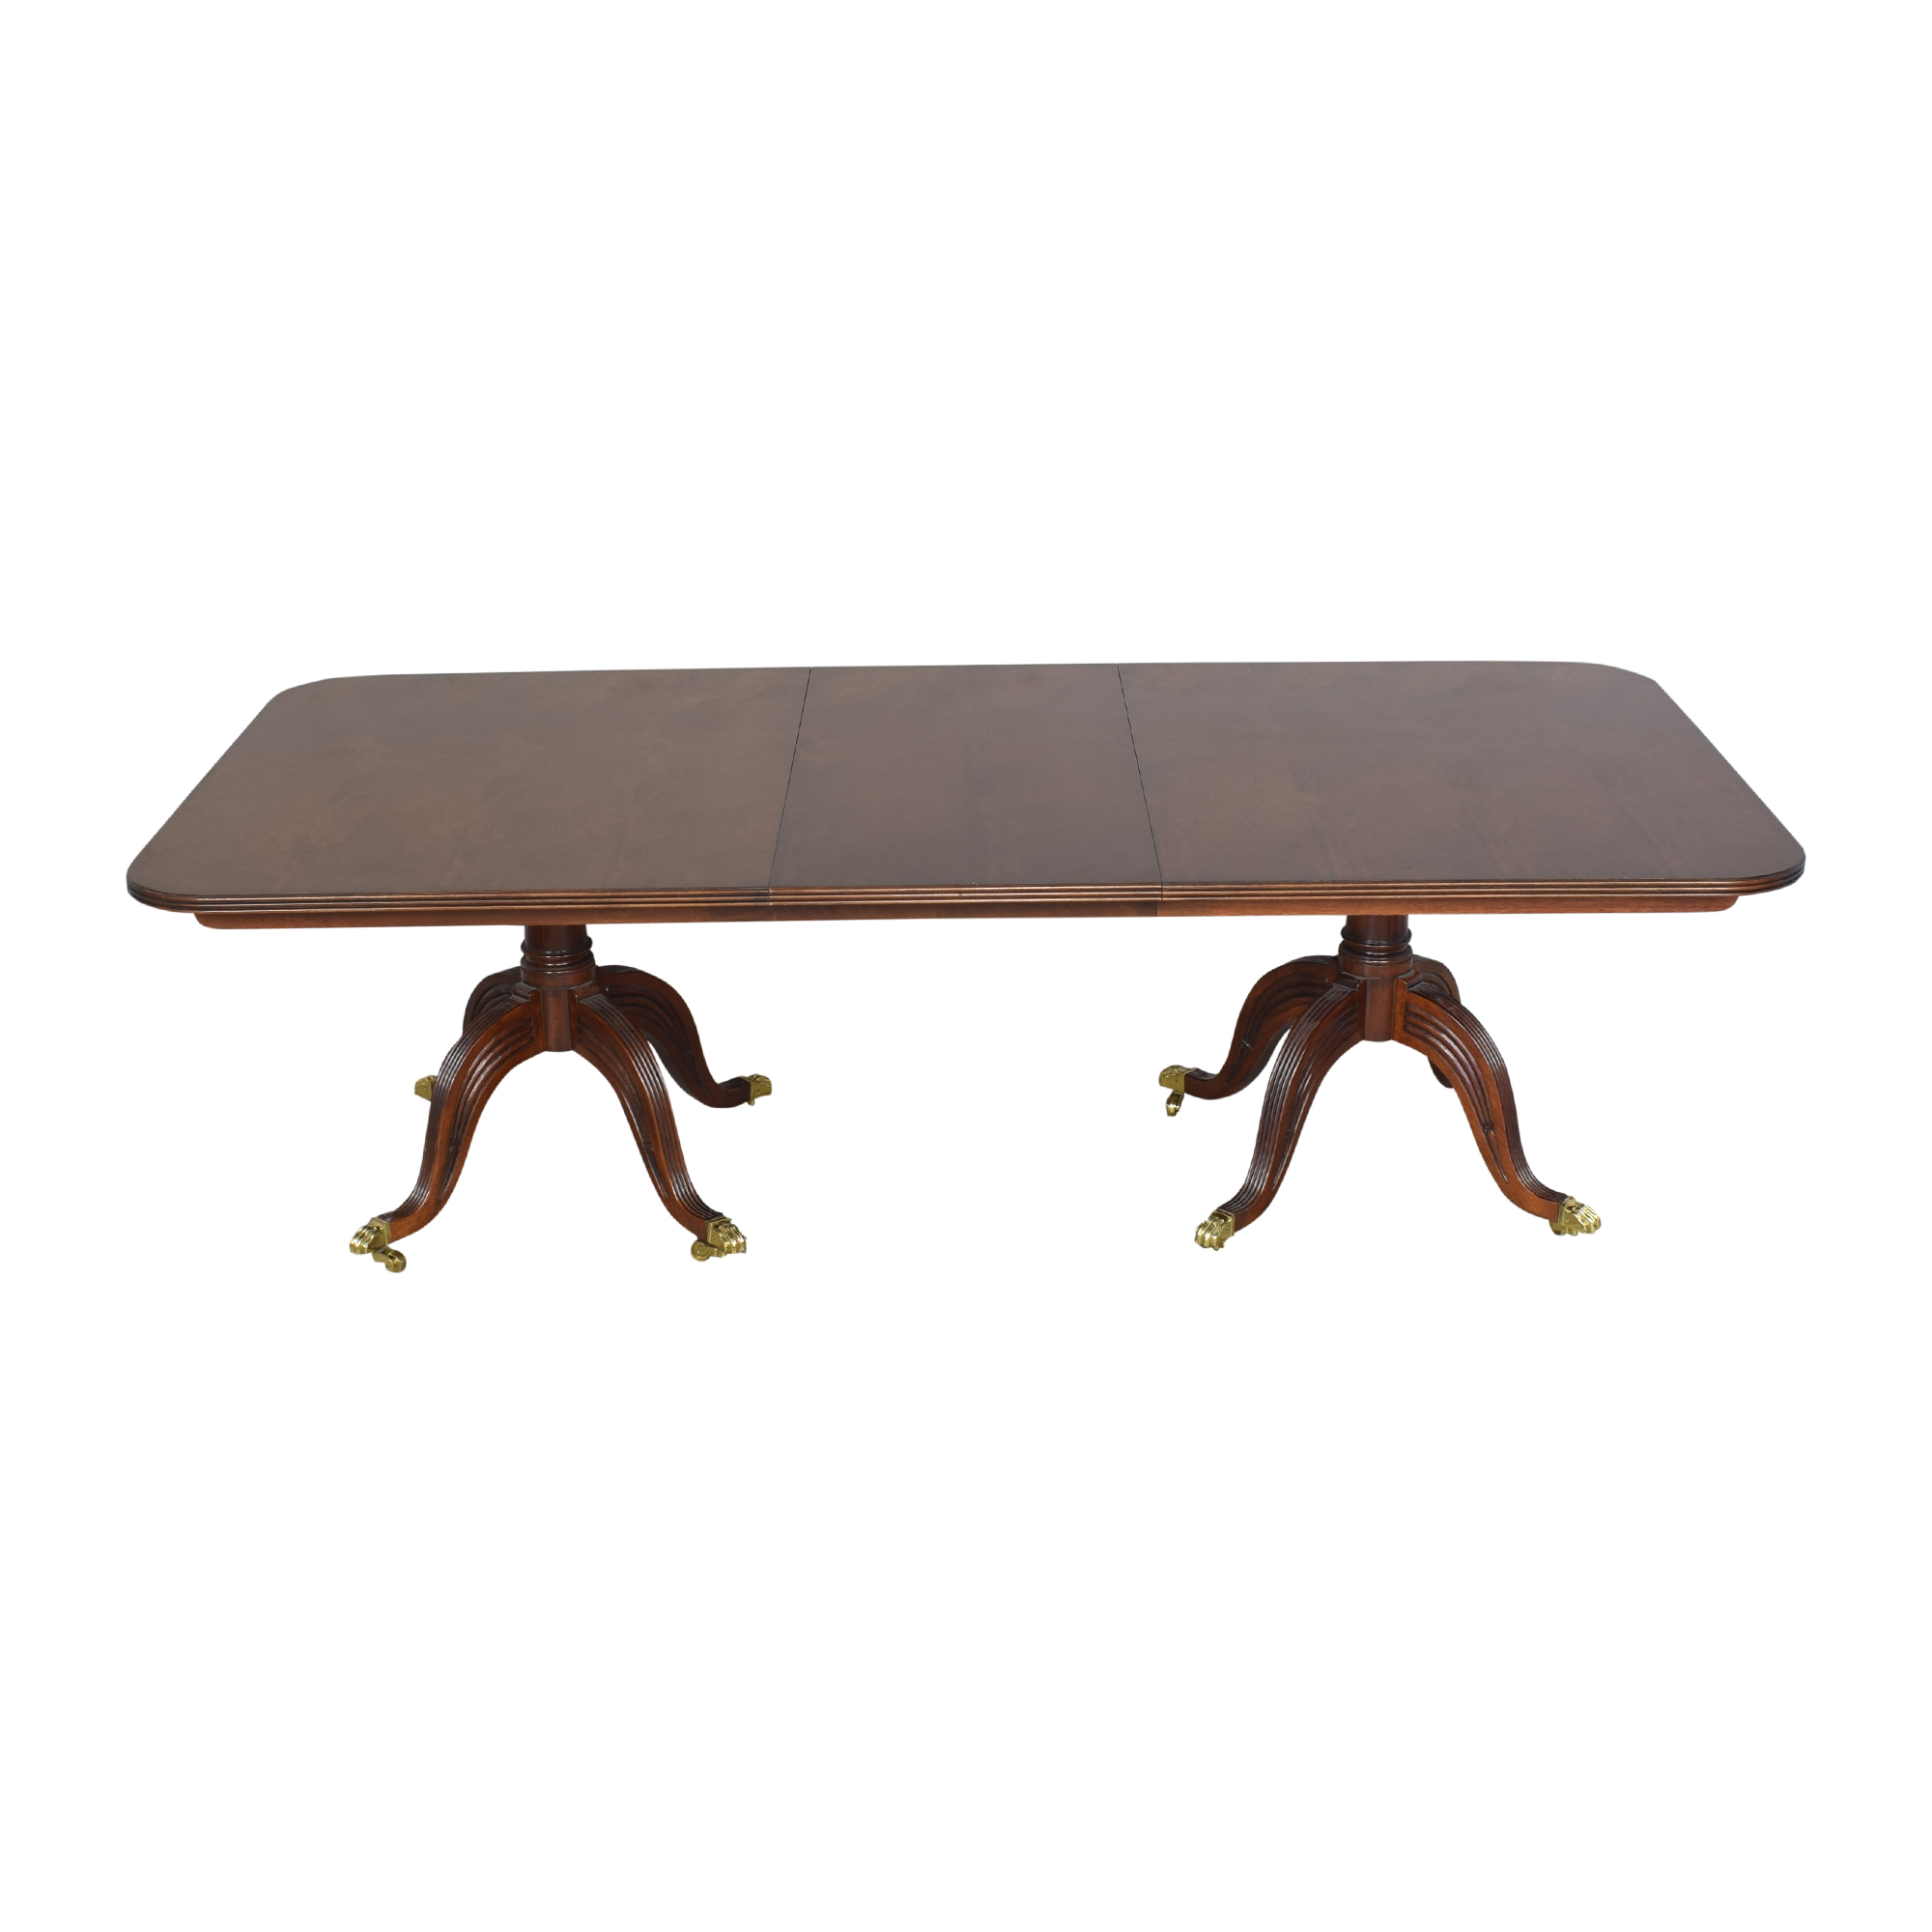 Henredon Furniture Henredon Double Pedestal Extendable Dining Table nj